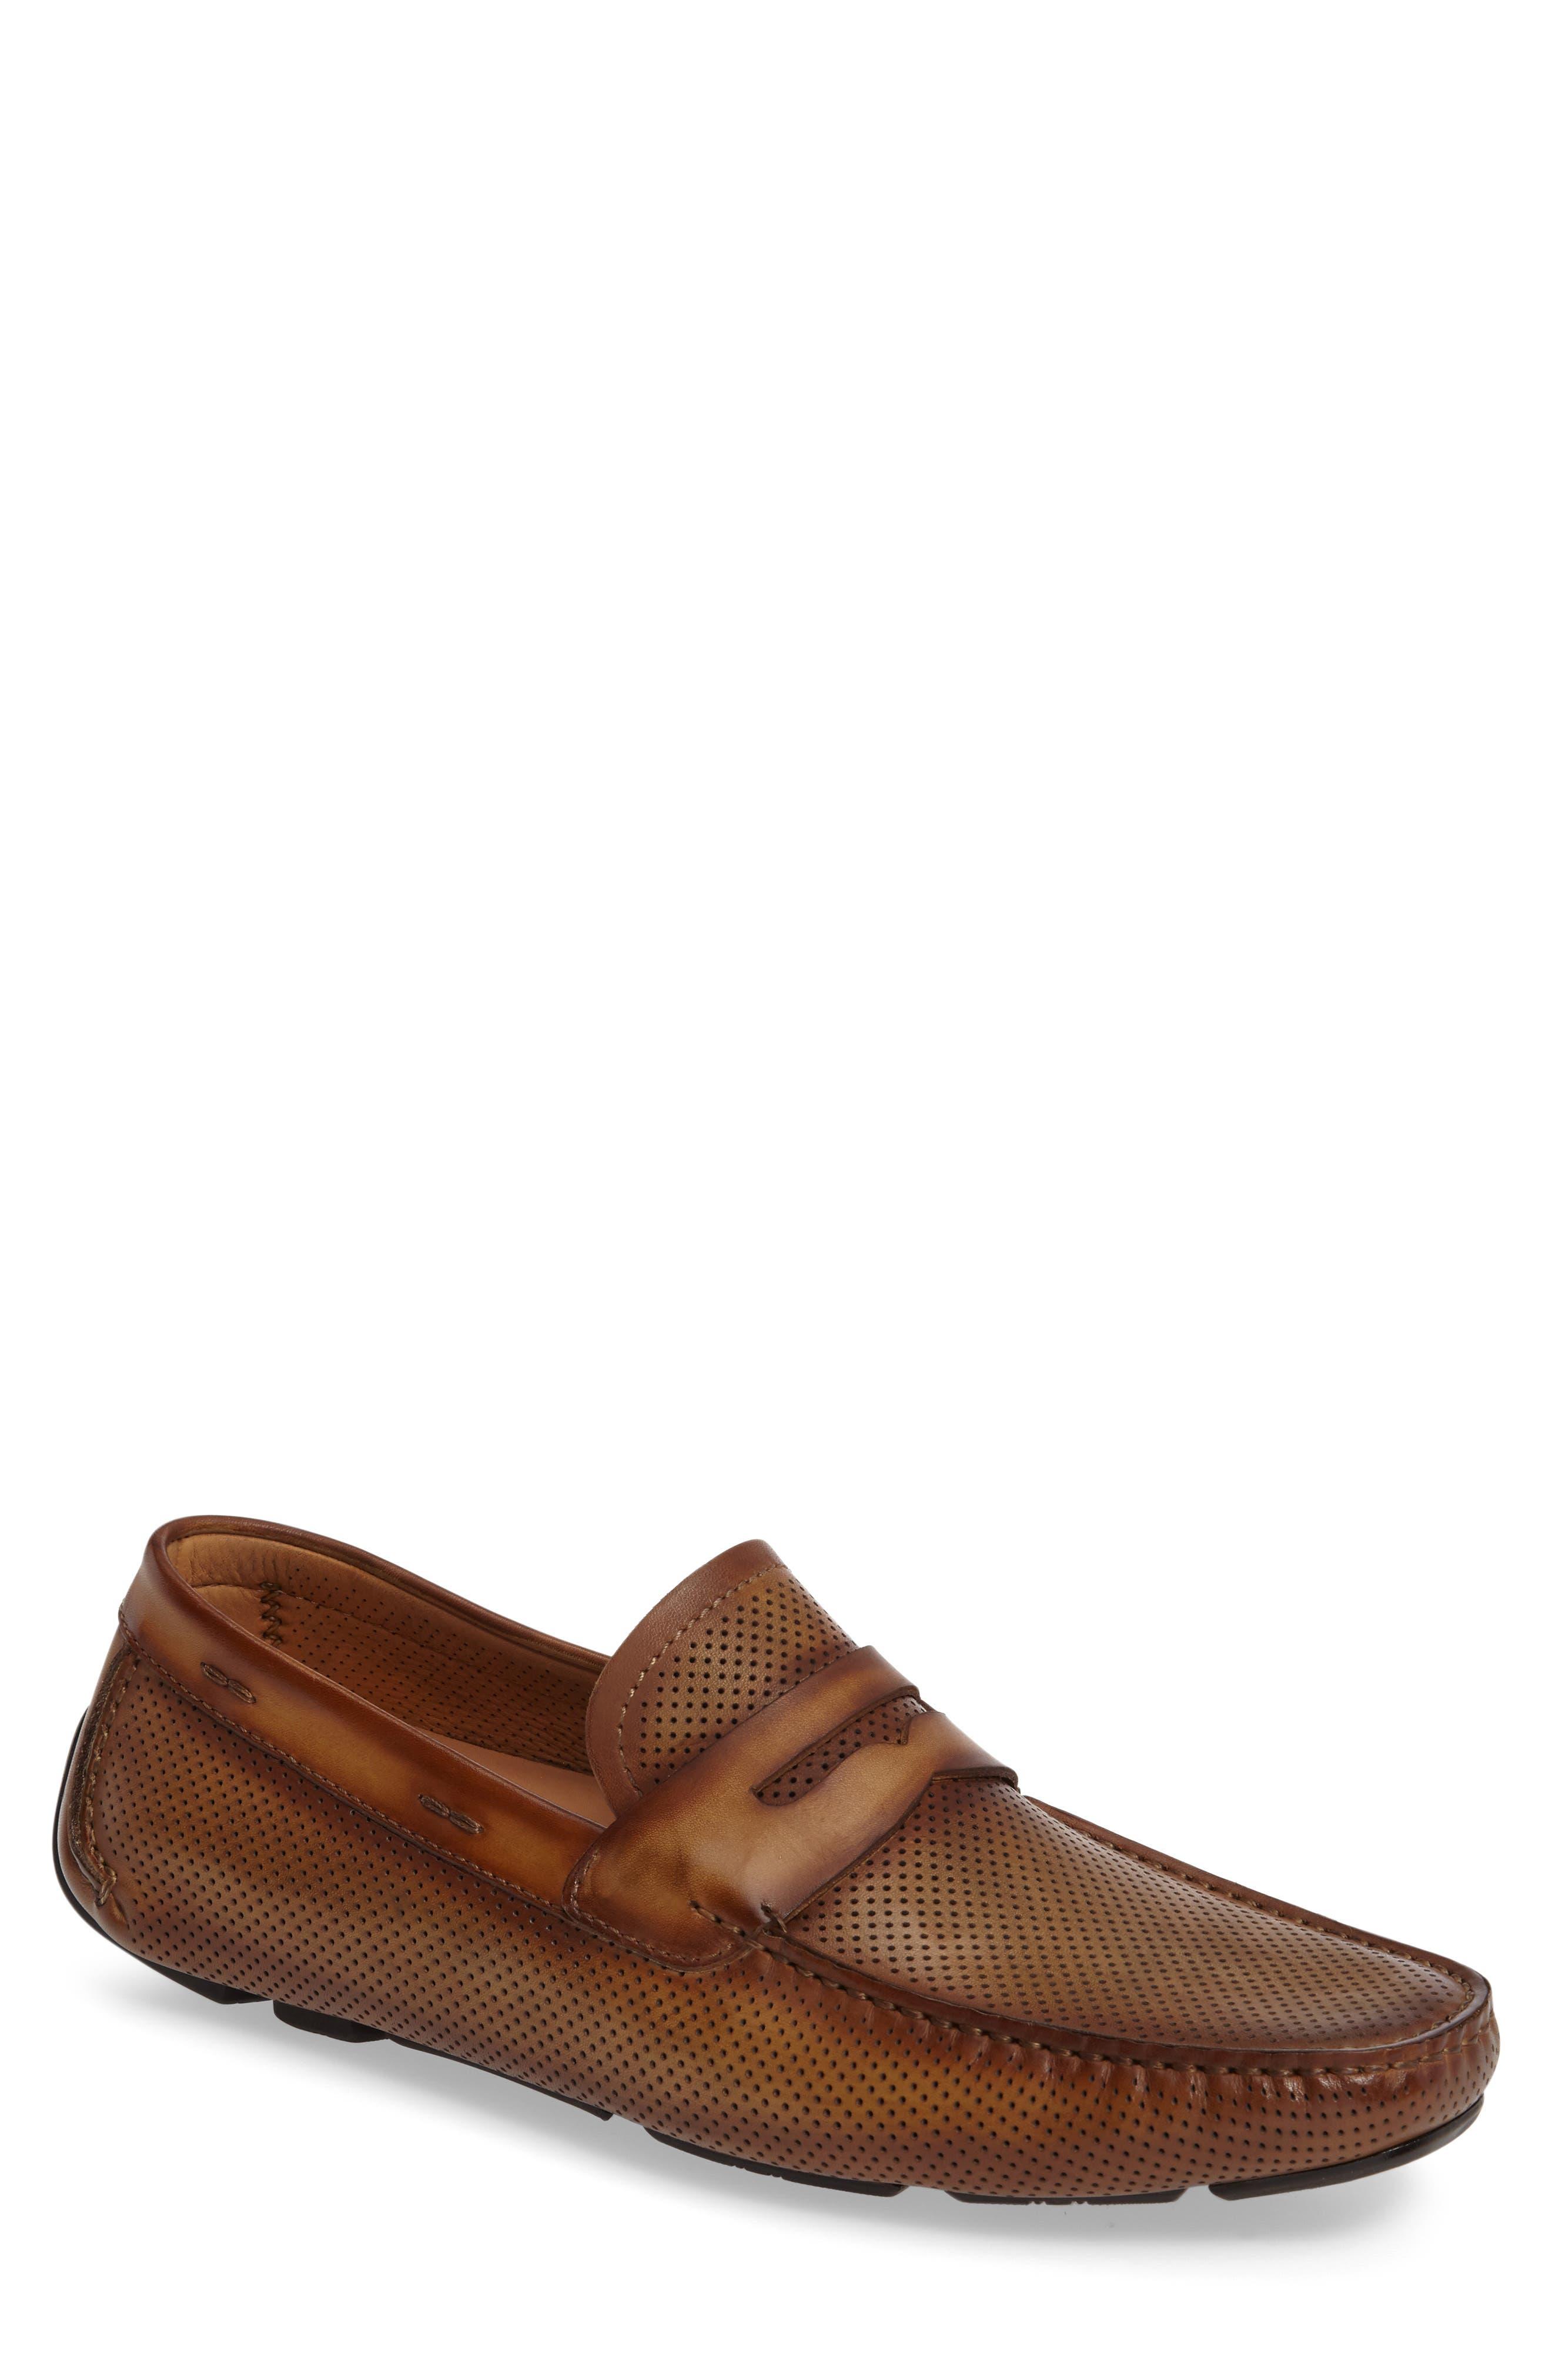 Magnanni Damian Driving Shoe (Men)